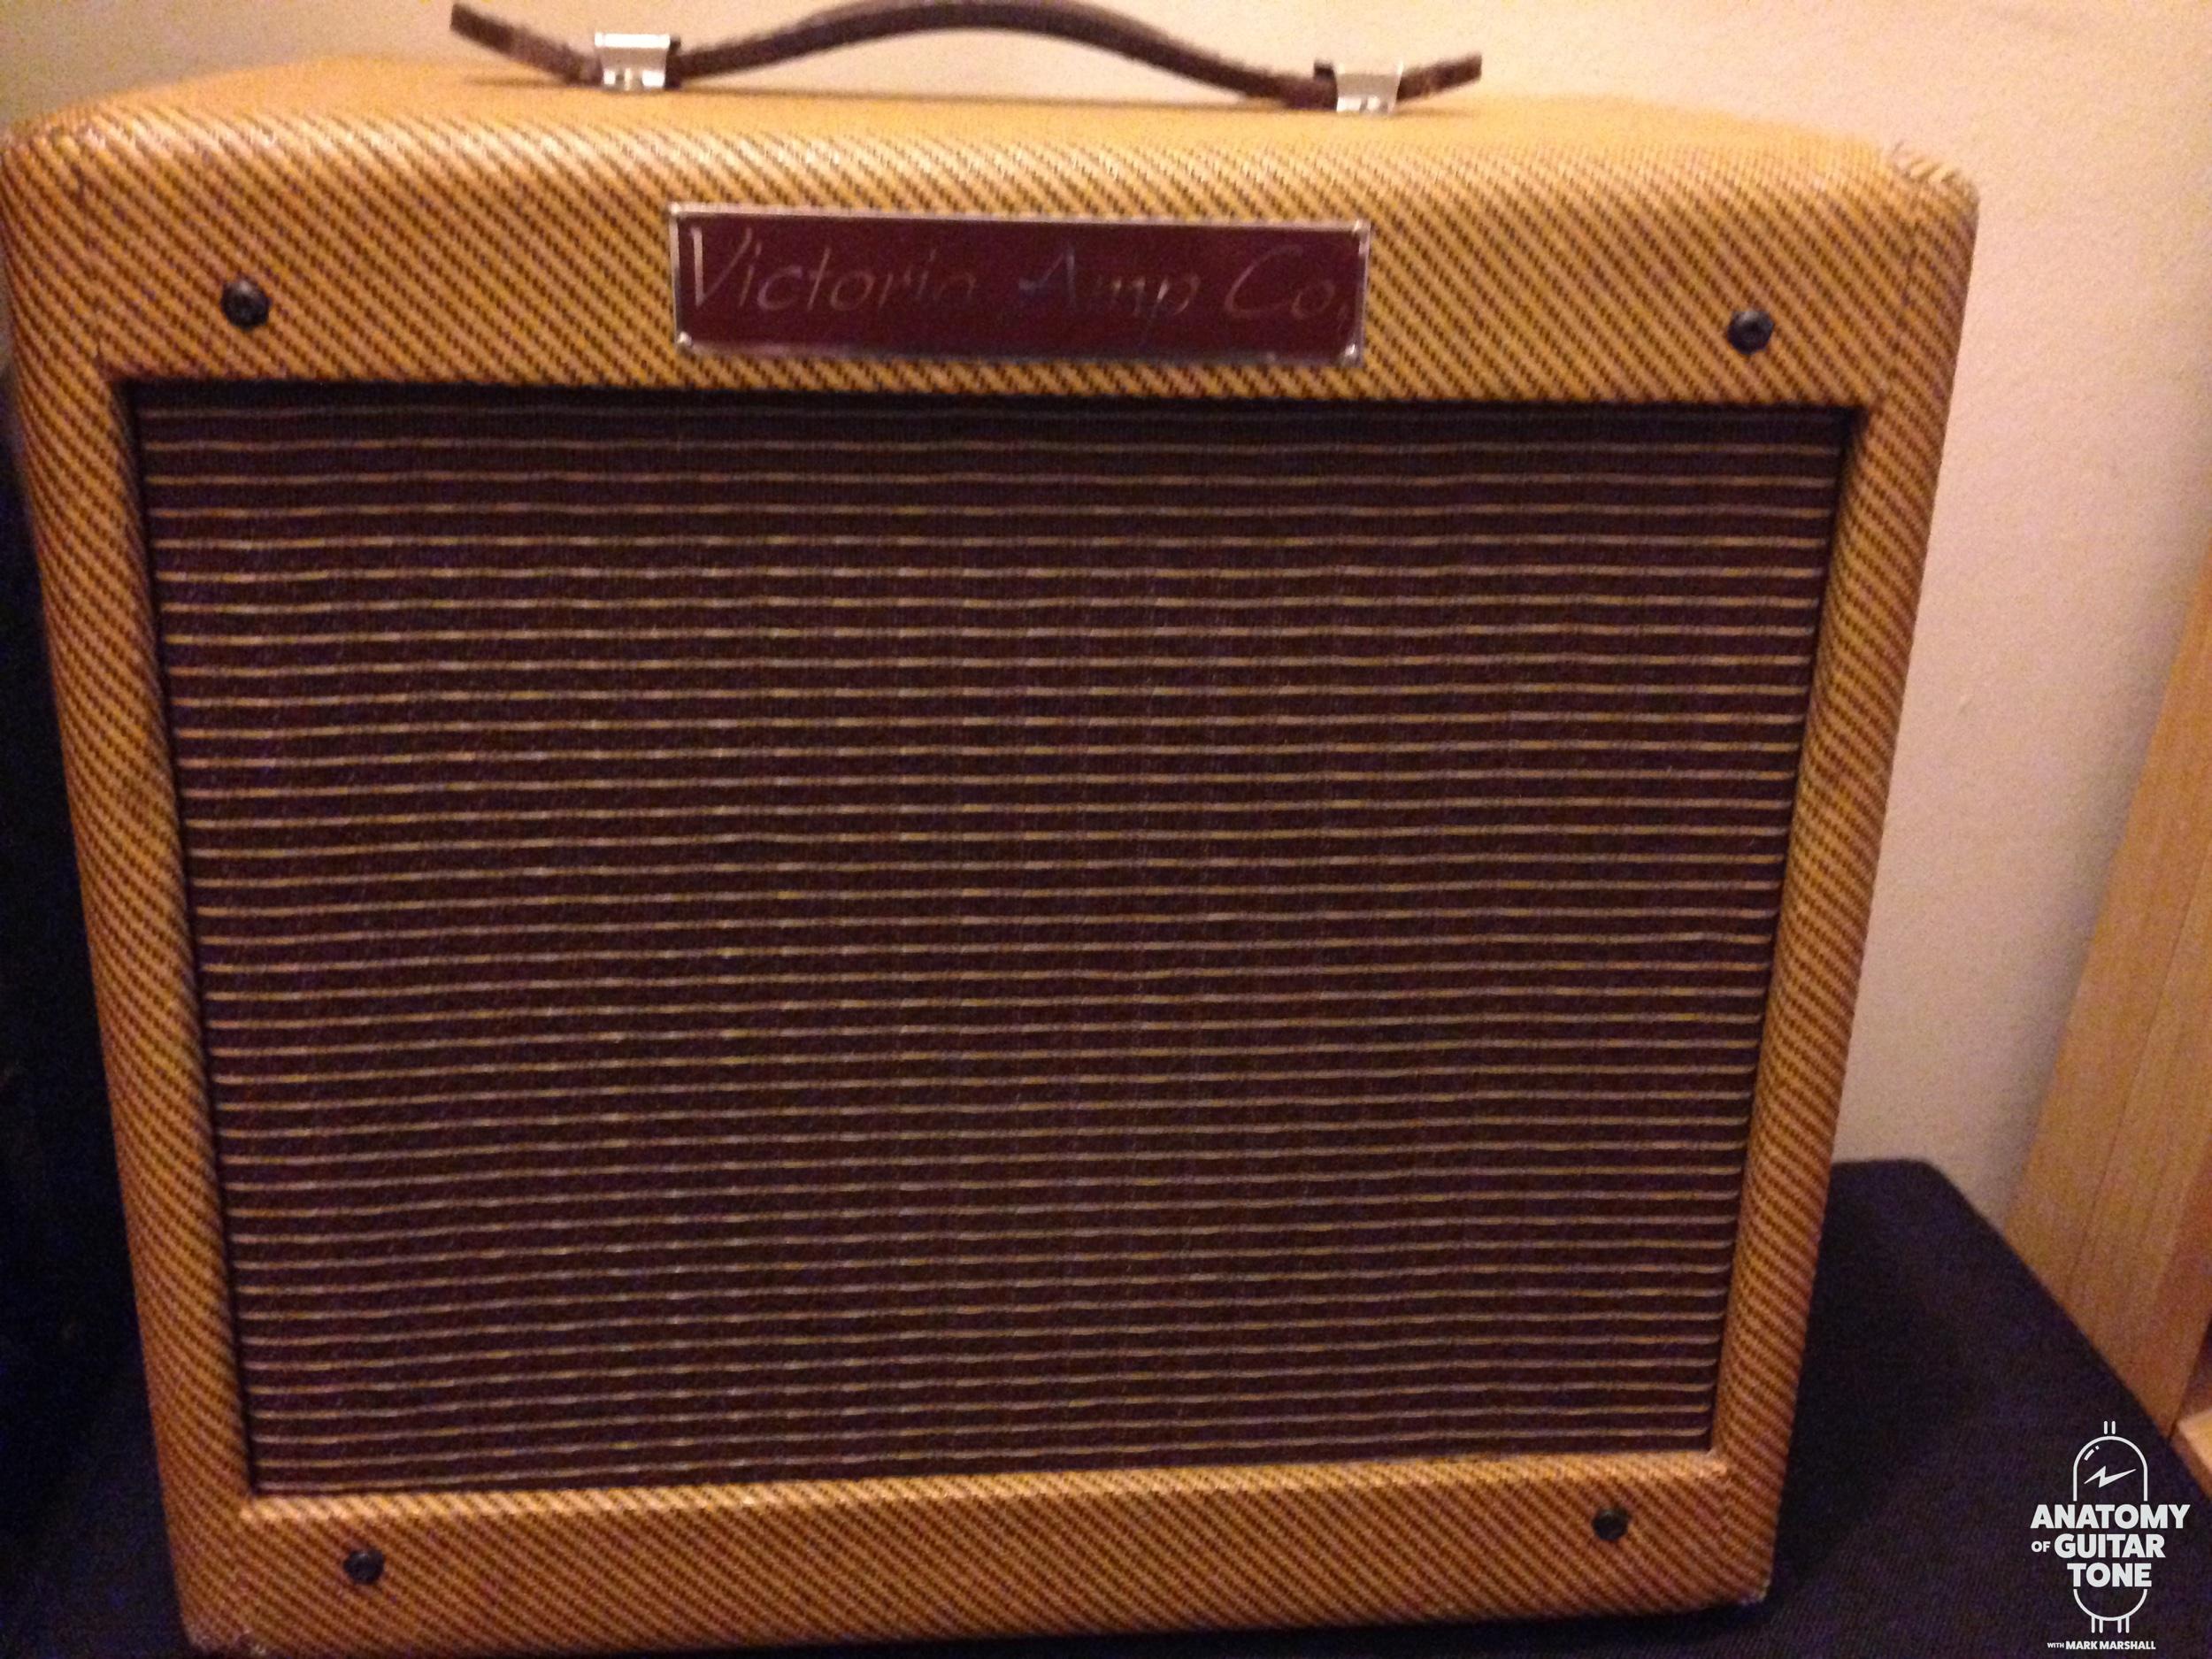 Victoria 518 (5 watt amp)